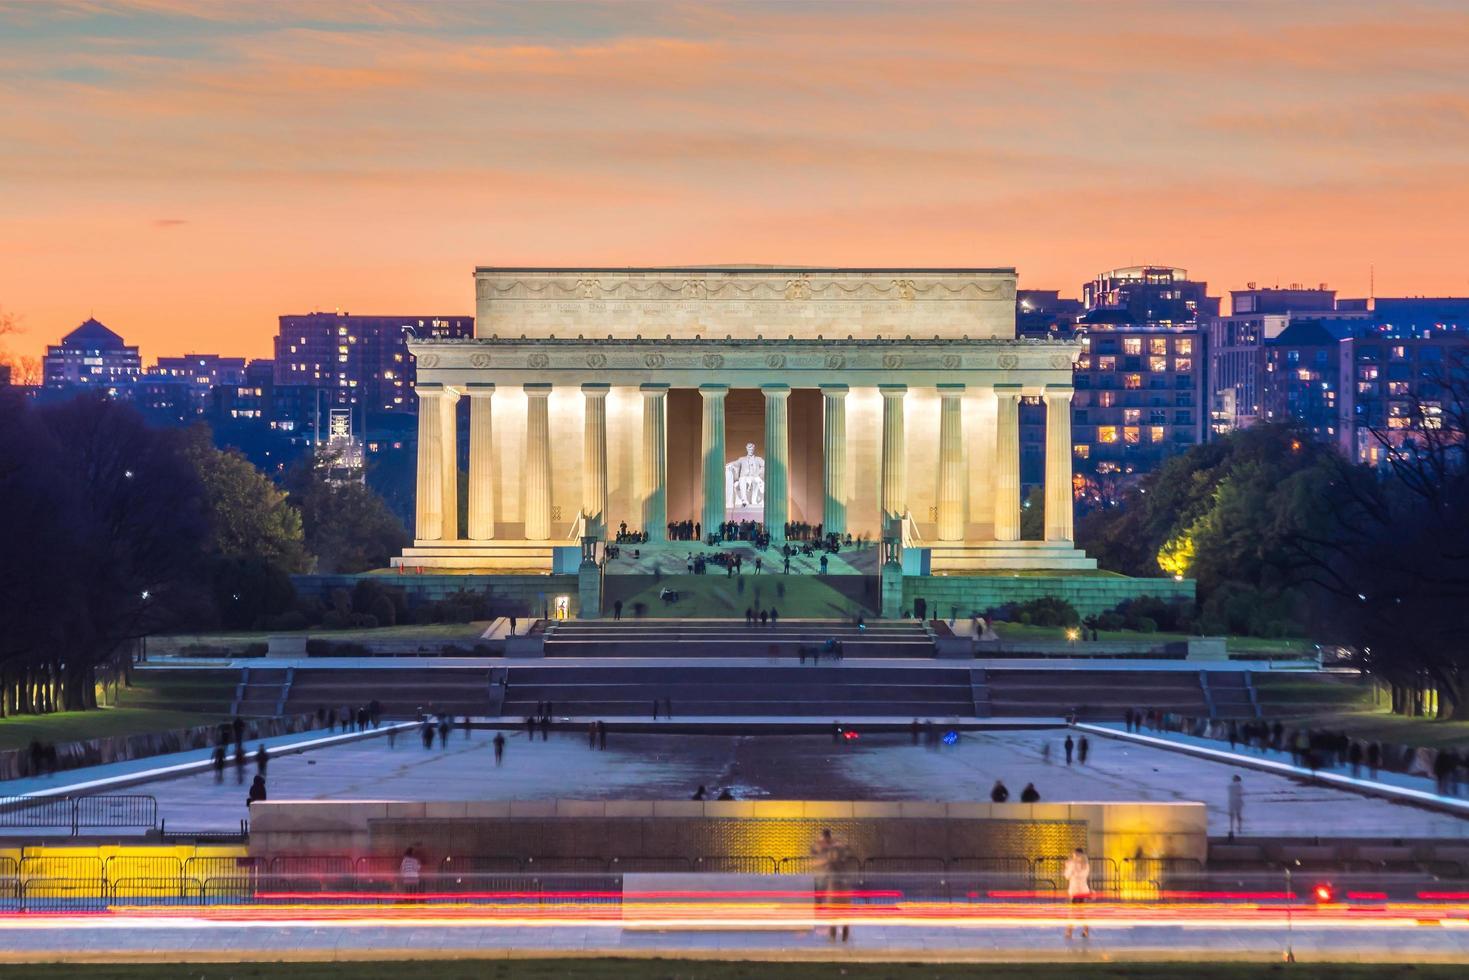 Abraham Lincoln Memorial in Washington, D.C. United States photo